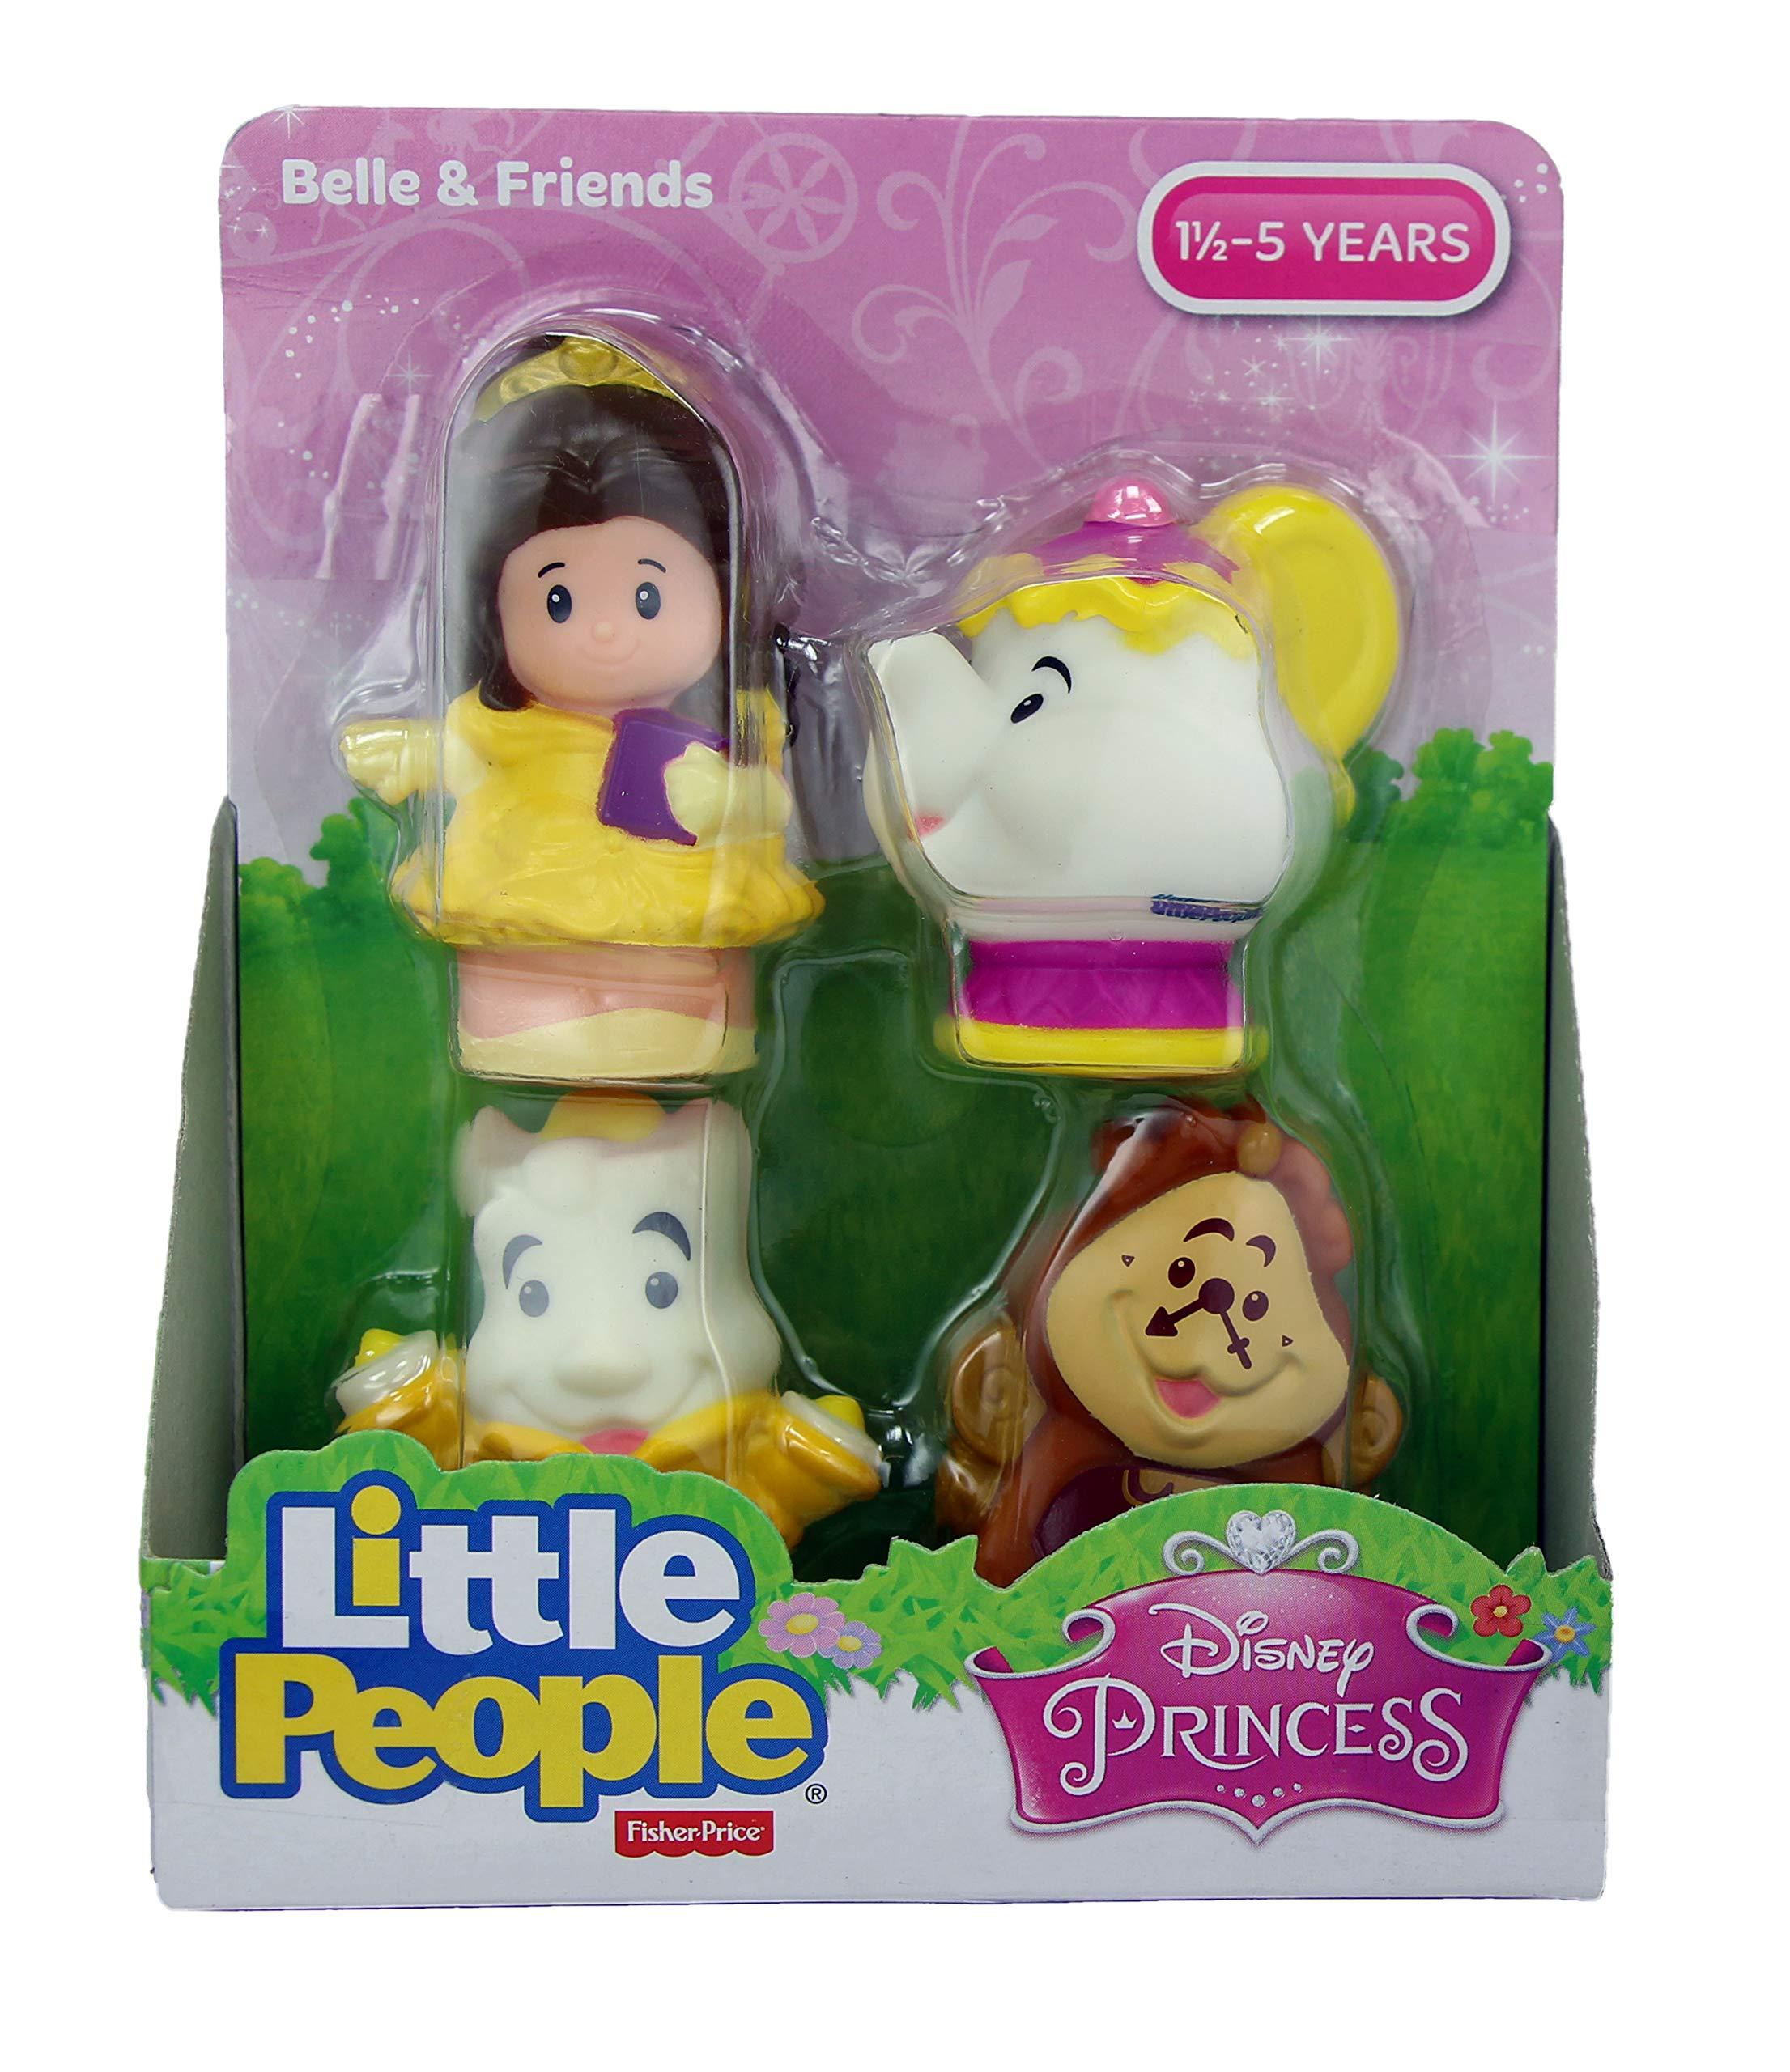 Fisher Price Little People Disney Princess & Friends Figure Set of 4 - Belle, Cinderella, Jasmin & Rapunzel by Disney Princess (Image #2)